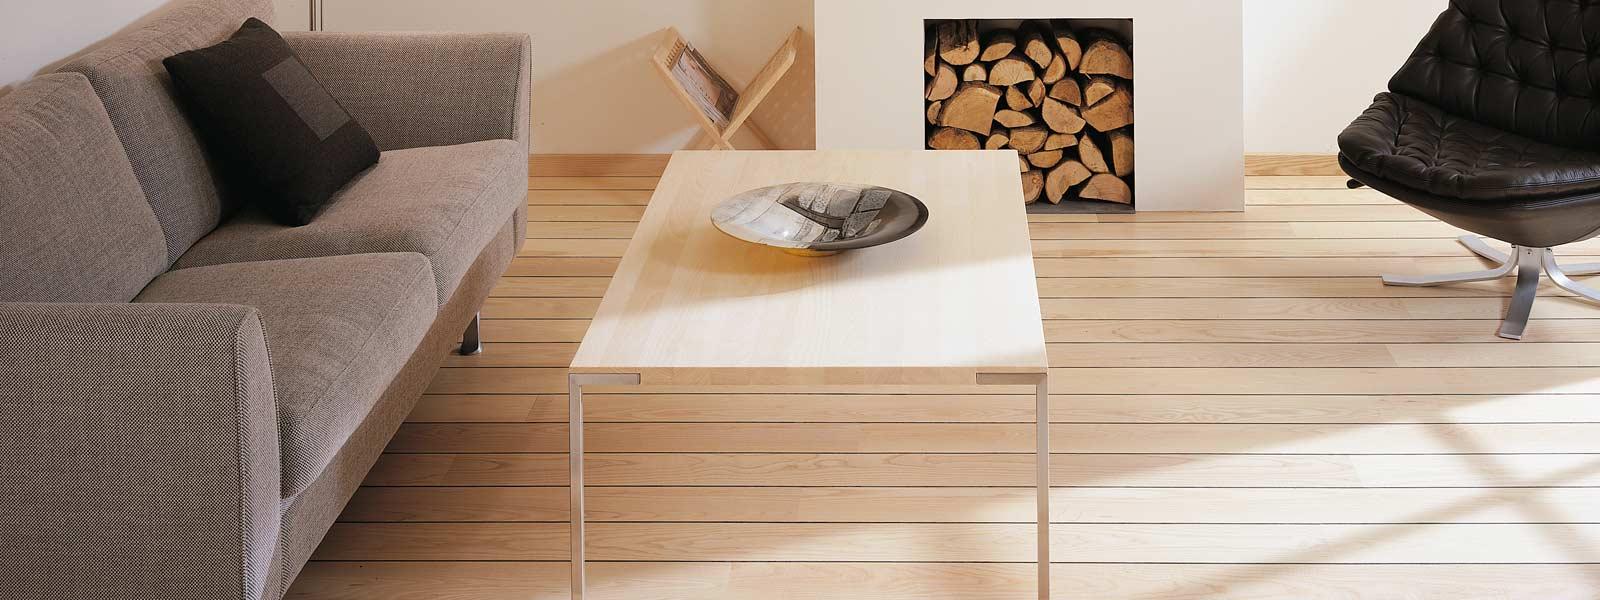 Wood lye and white oil